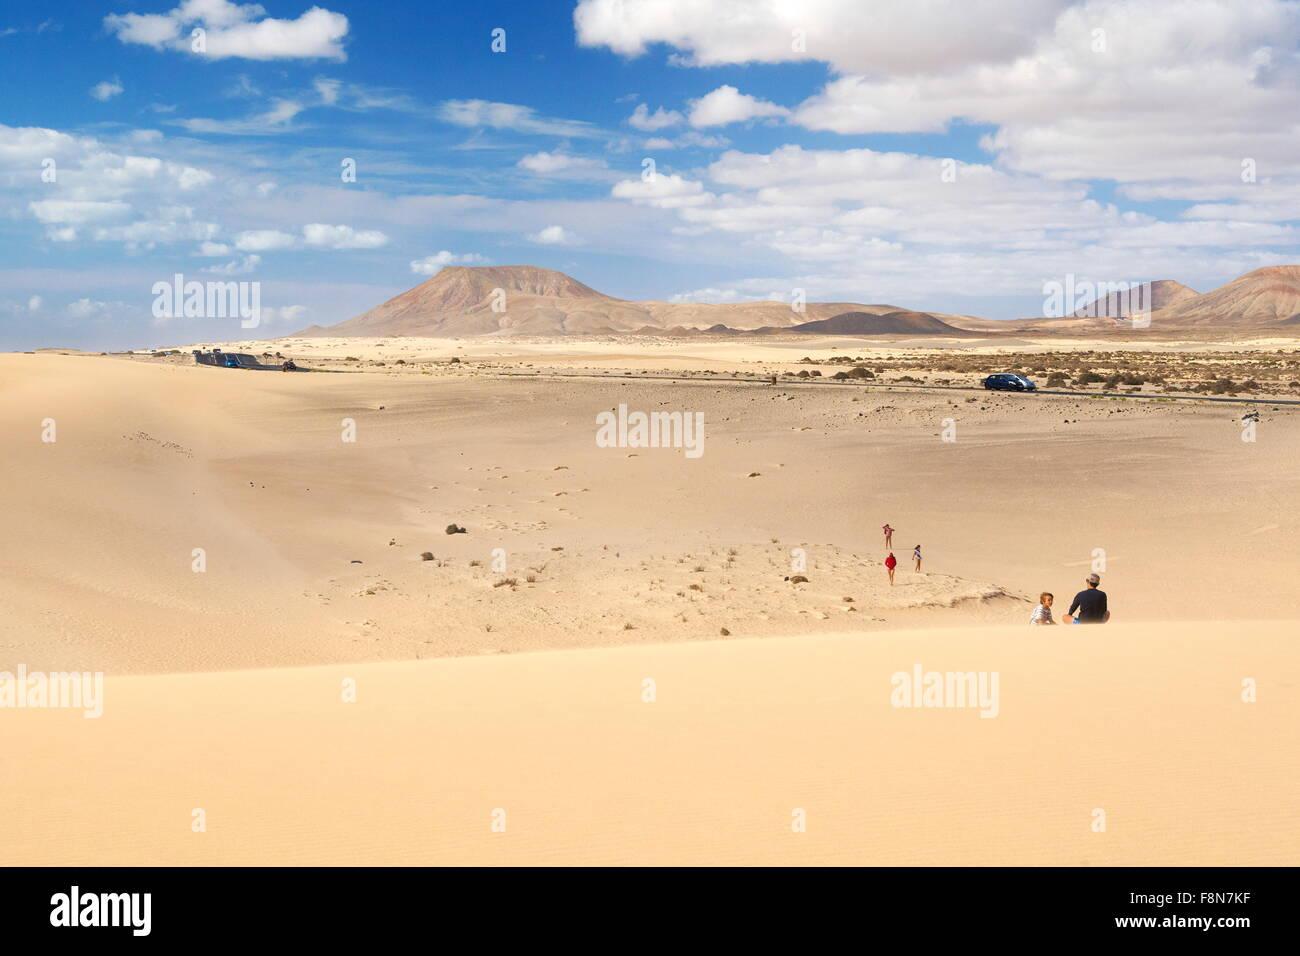 Sand dunes in Parque Natural de Corralejo, Canary Islands, Fuerteventura Island, Spain - Stock Image